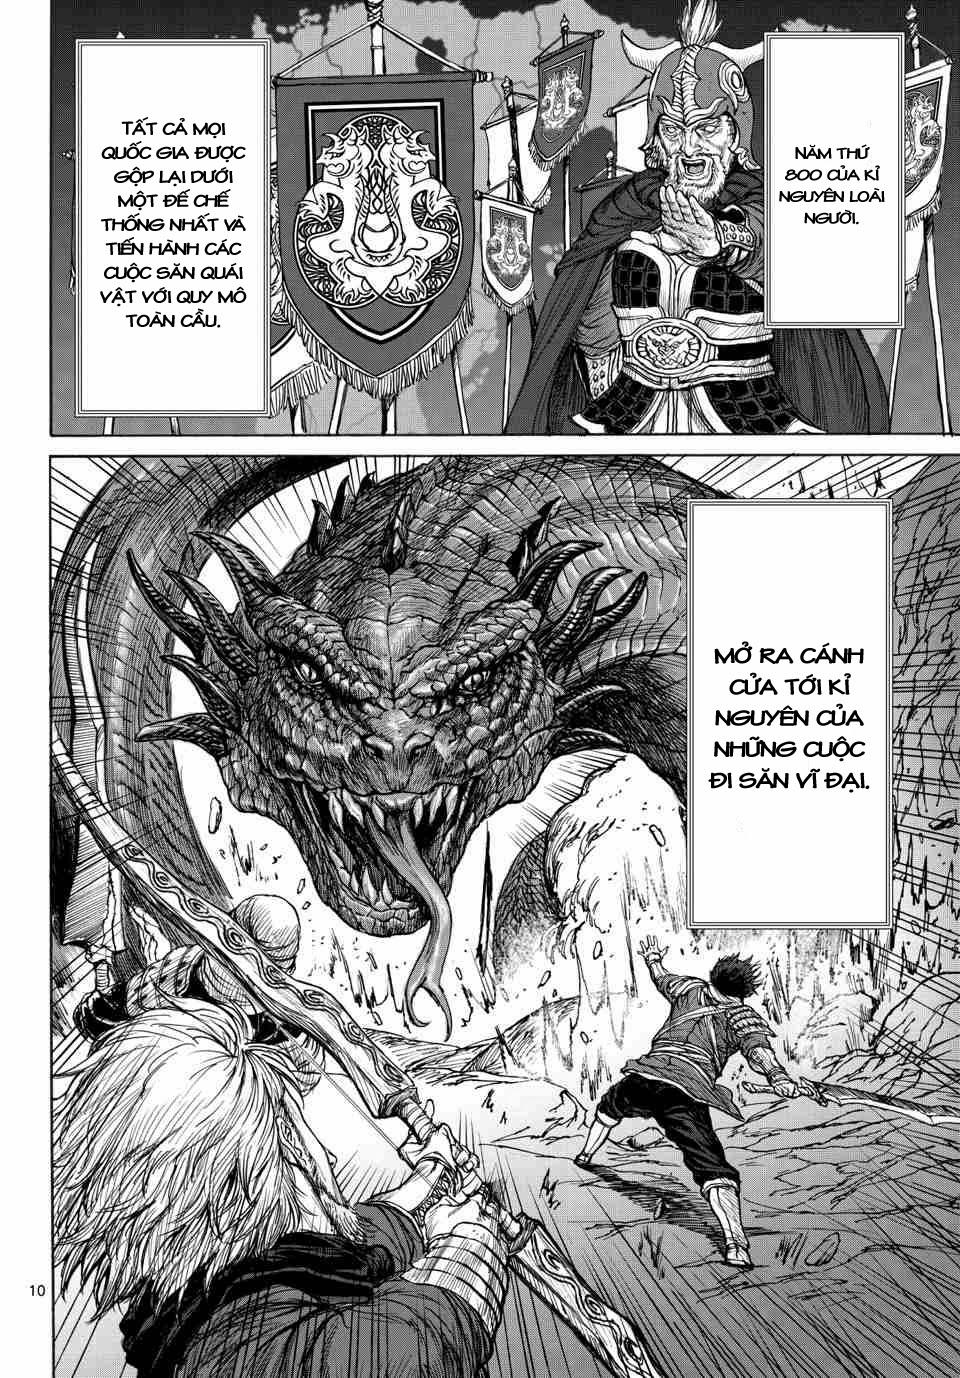 Monster X Monster chapter 1a trang 9